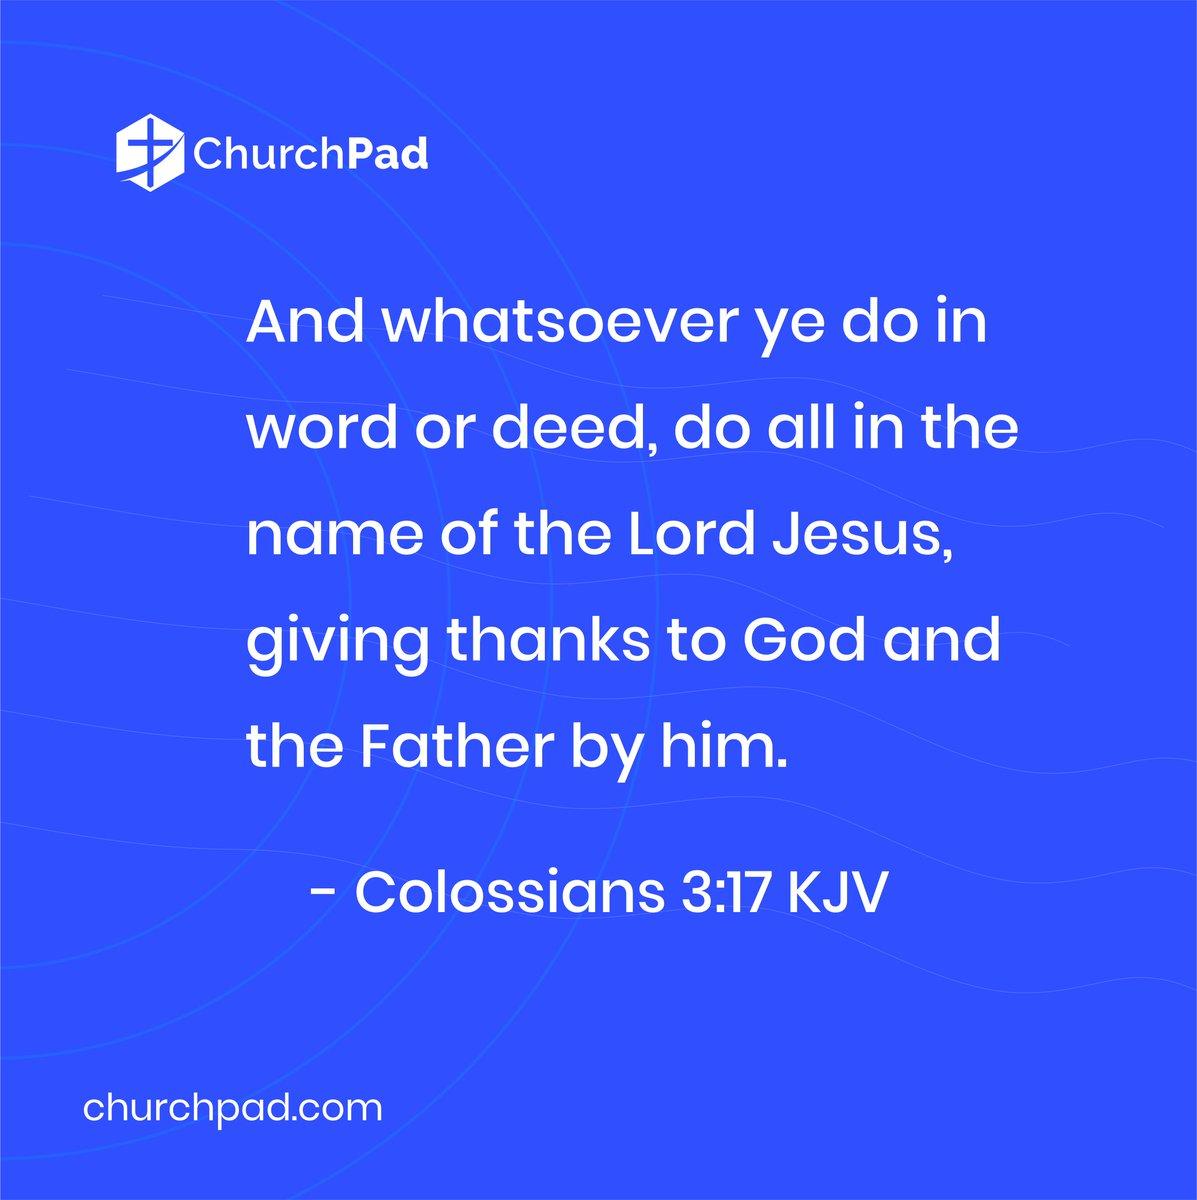 What are you grateful for?  #ChurchPad #ChurchTool #ChurchAdmin #Church #USAChurch #UKChurch #ChurchAdministration #OnlineChurch #DigitalChurch #ChurchOnline #Pastor #Pastors #Grateful